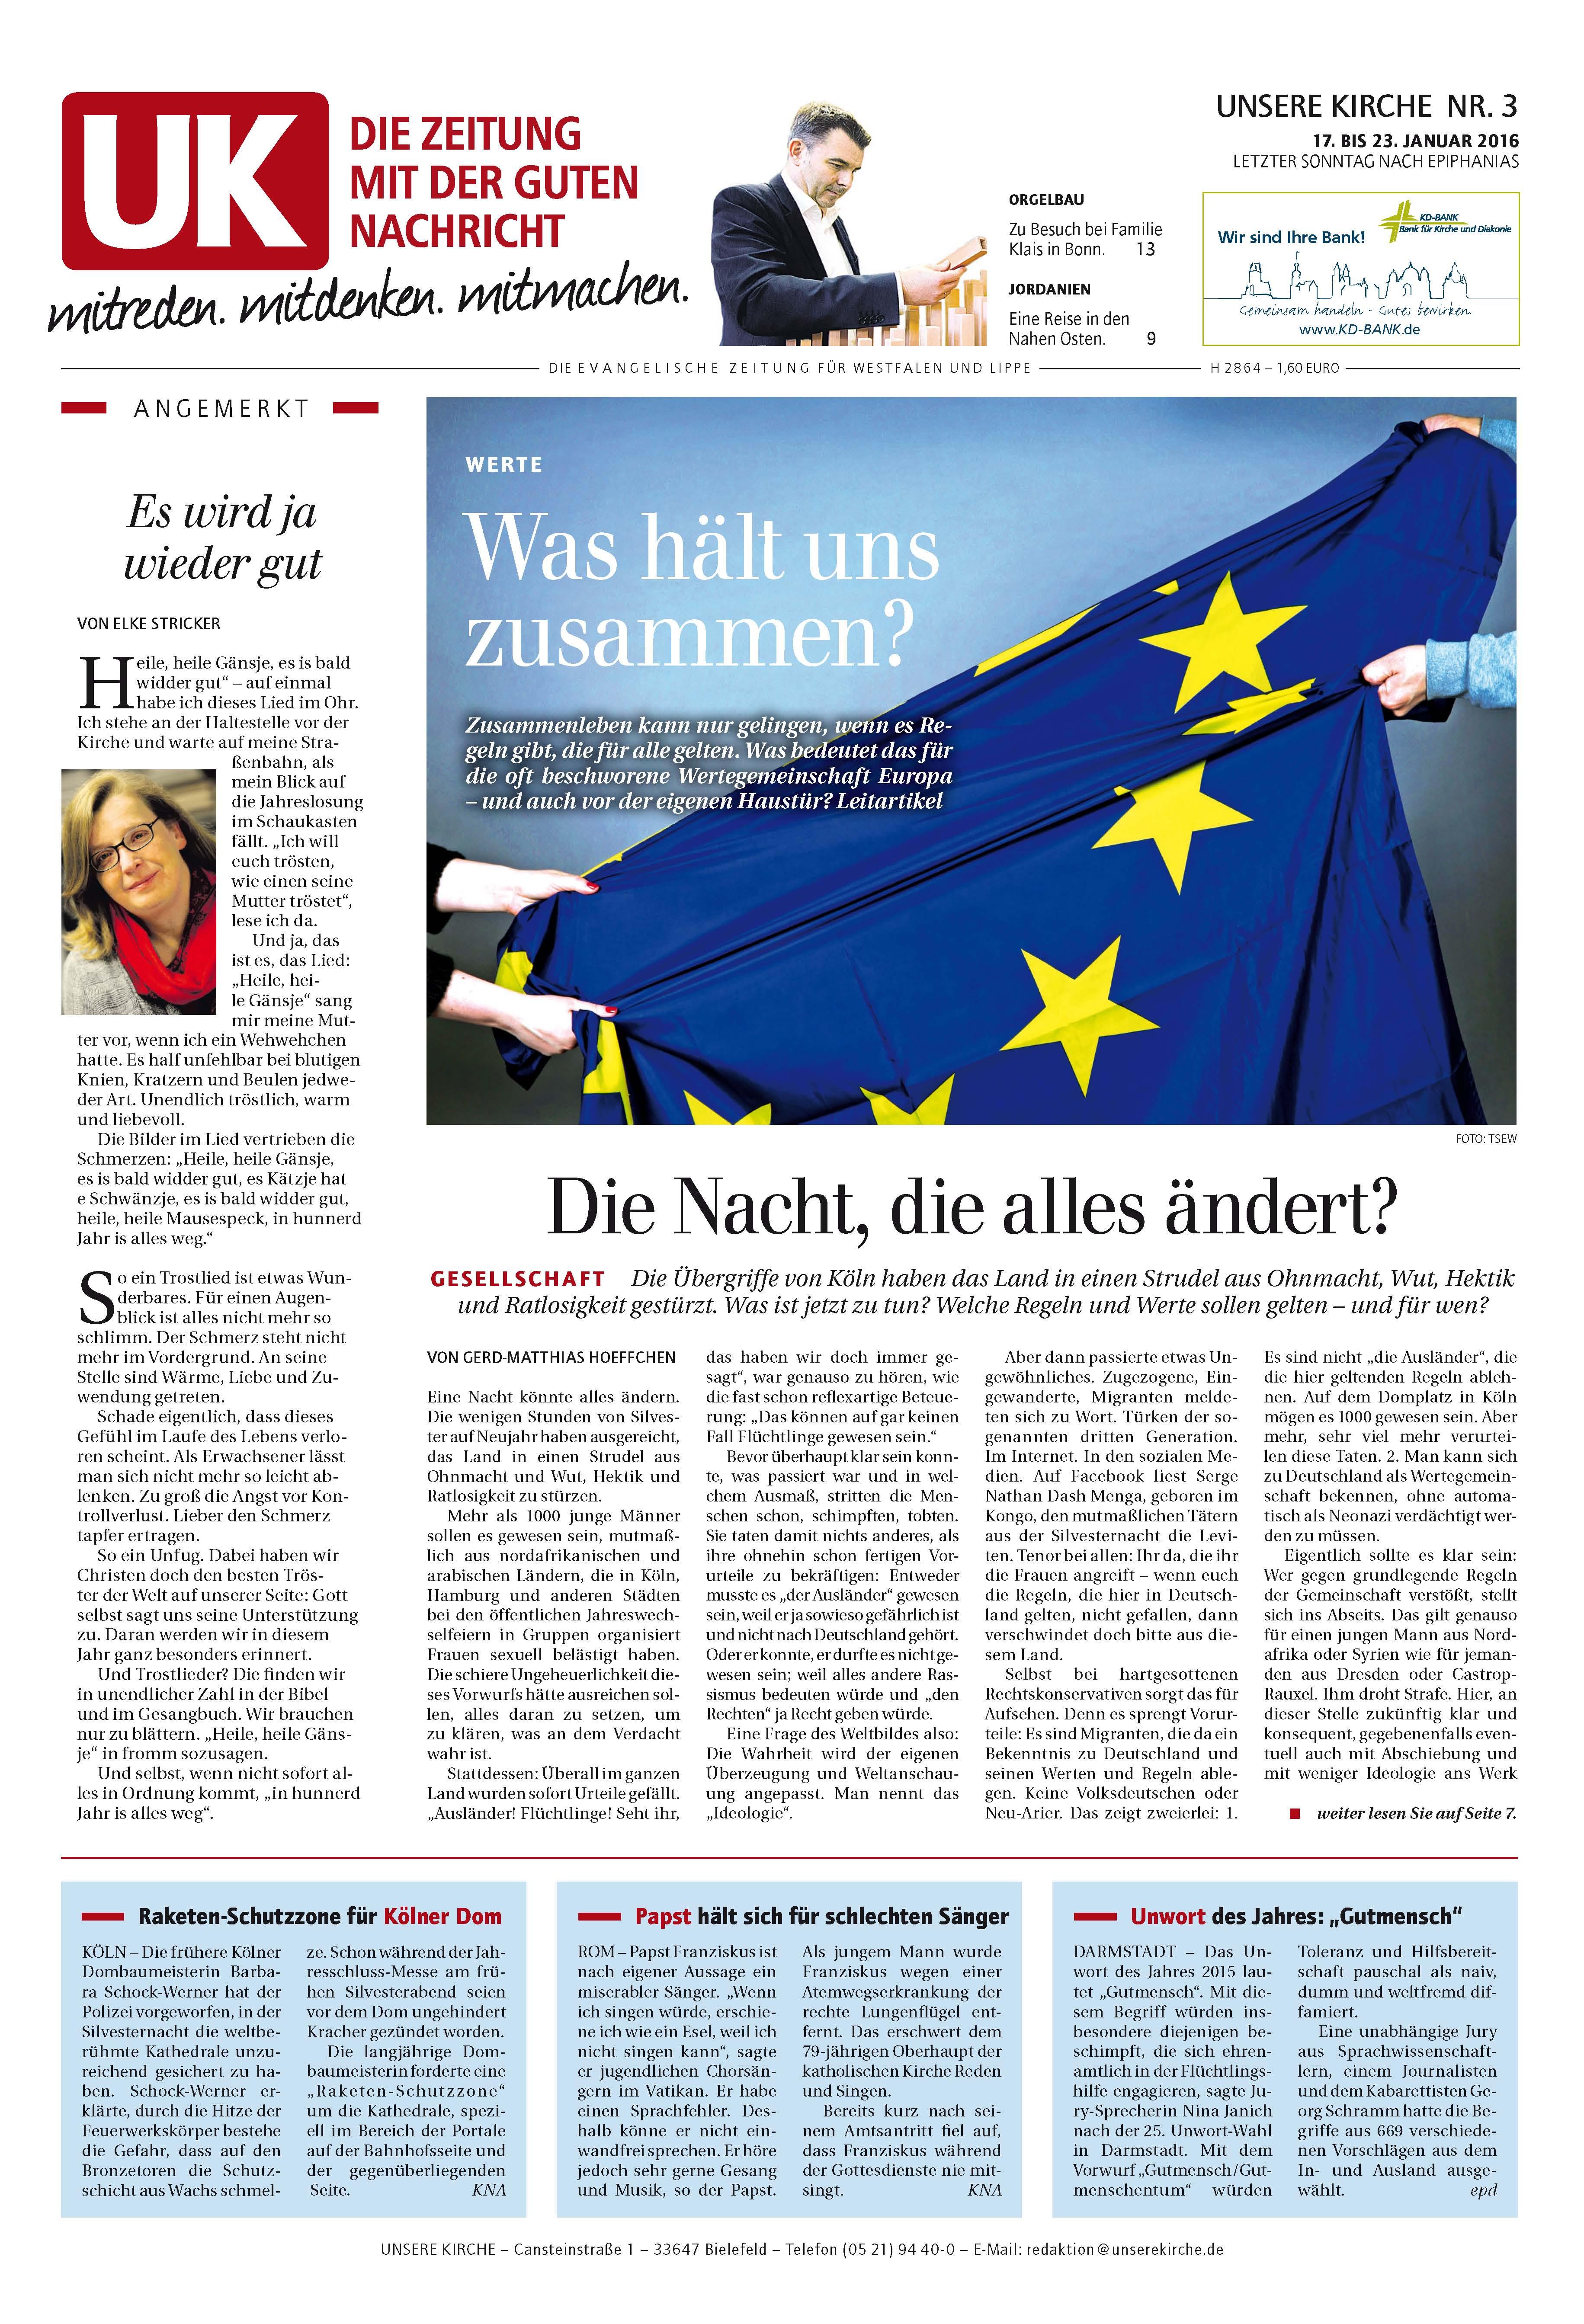 Kirchenzeitung UNSERE KIRCHE - Leseprobe